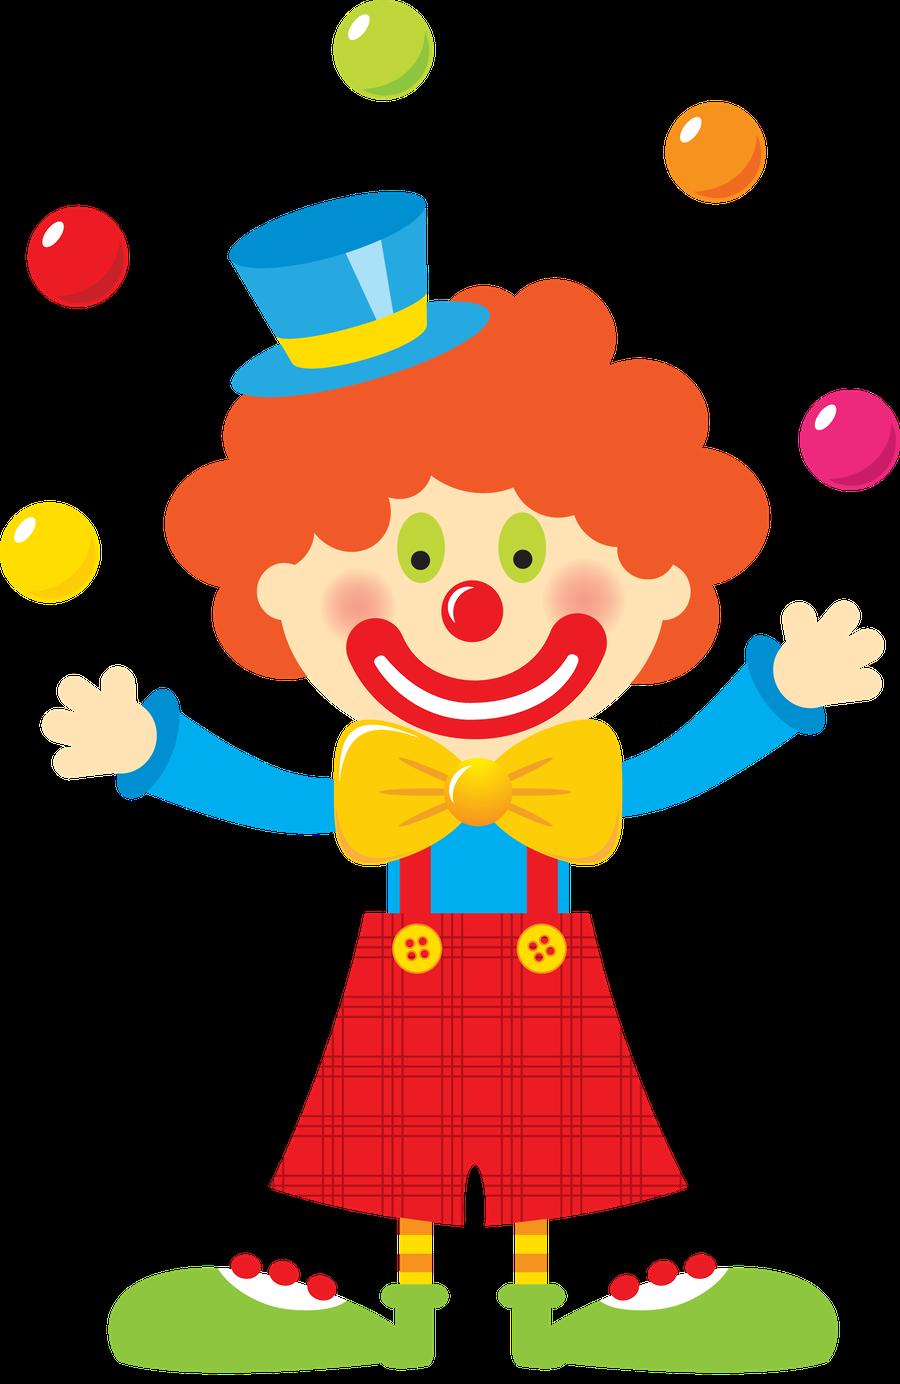 Kelly Marinho Kellkristy Minus Com Jongleur Clown Mignon Et